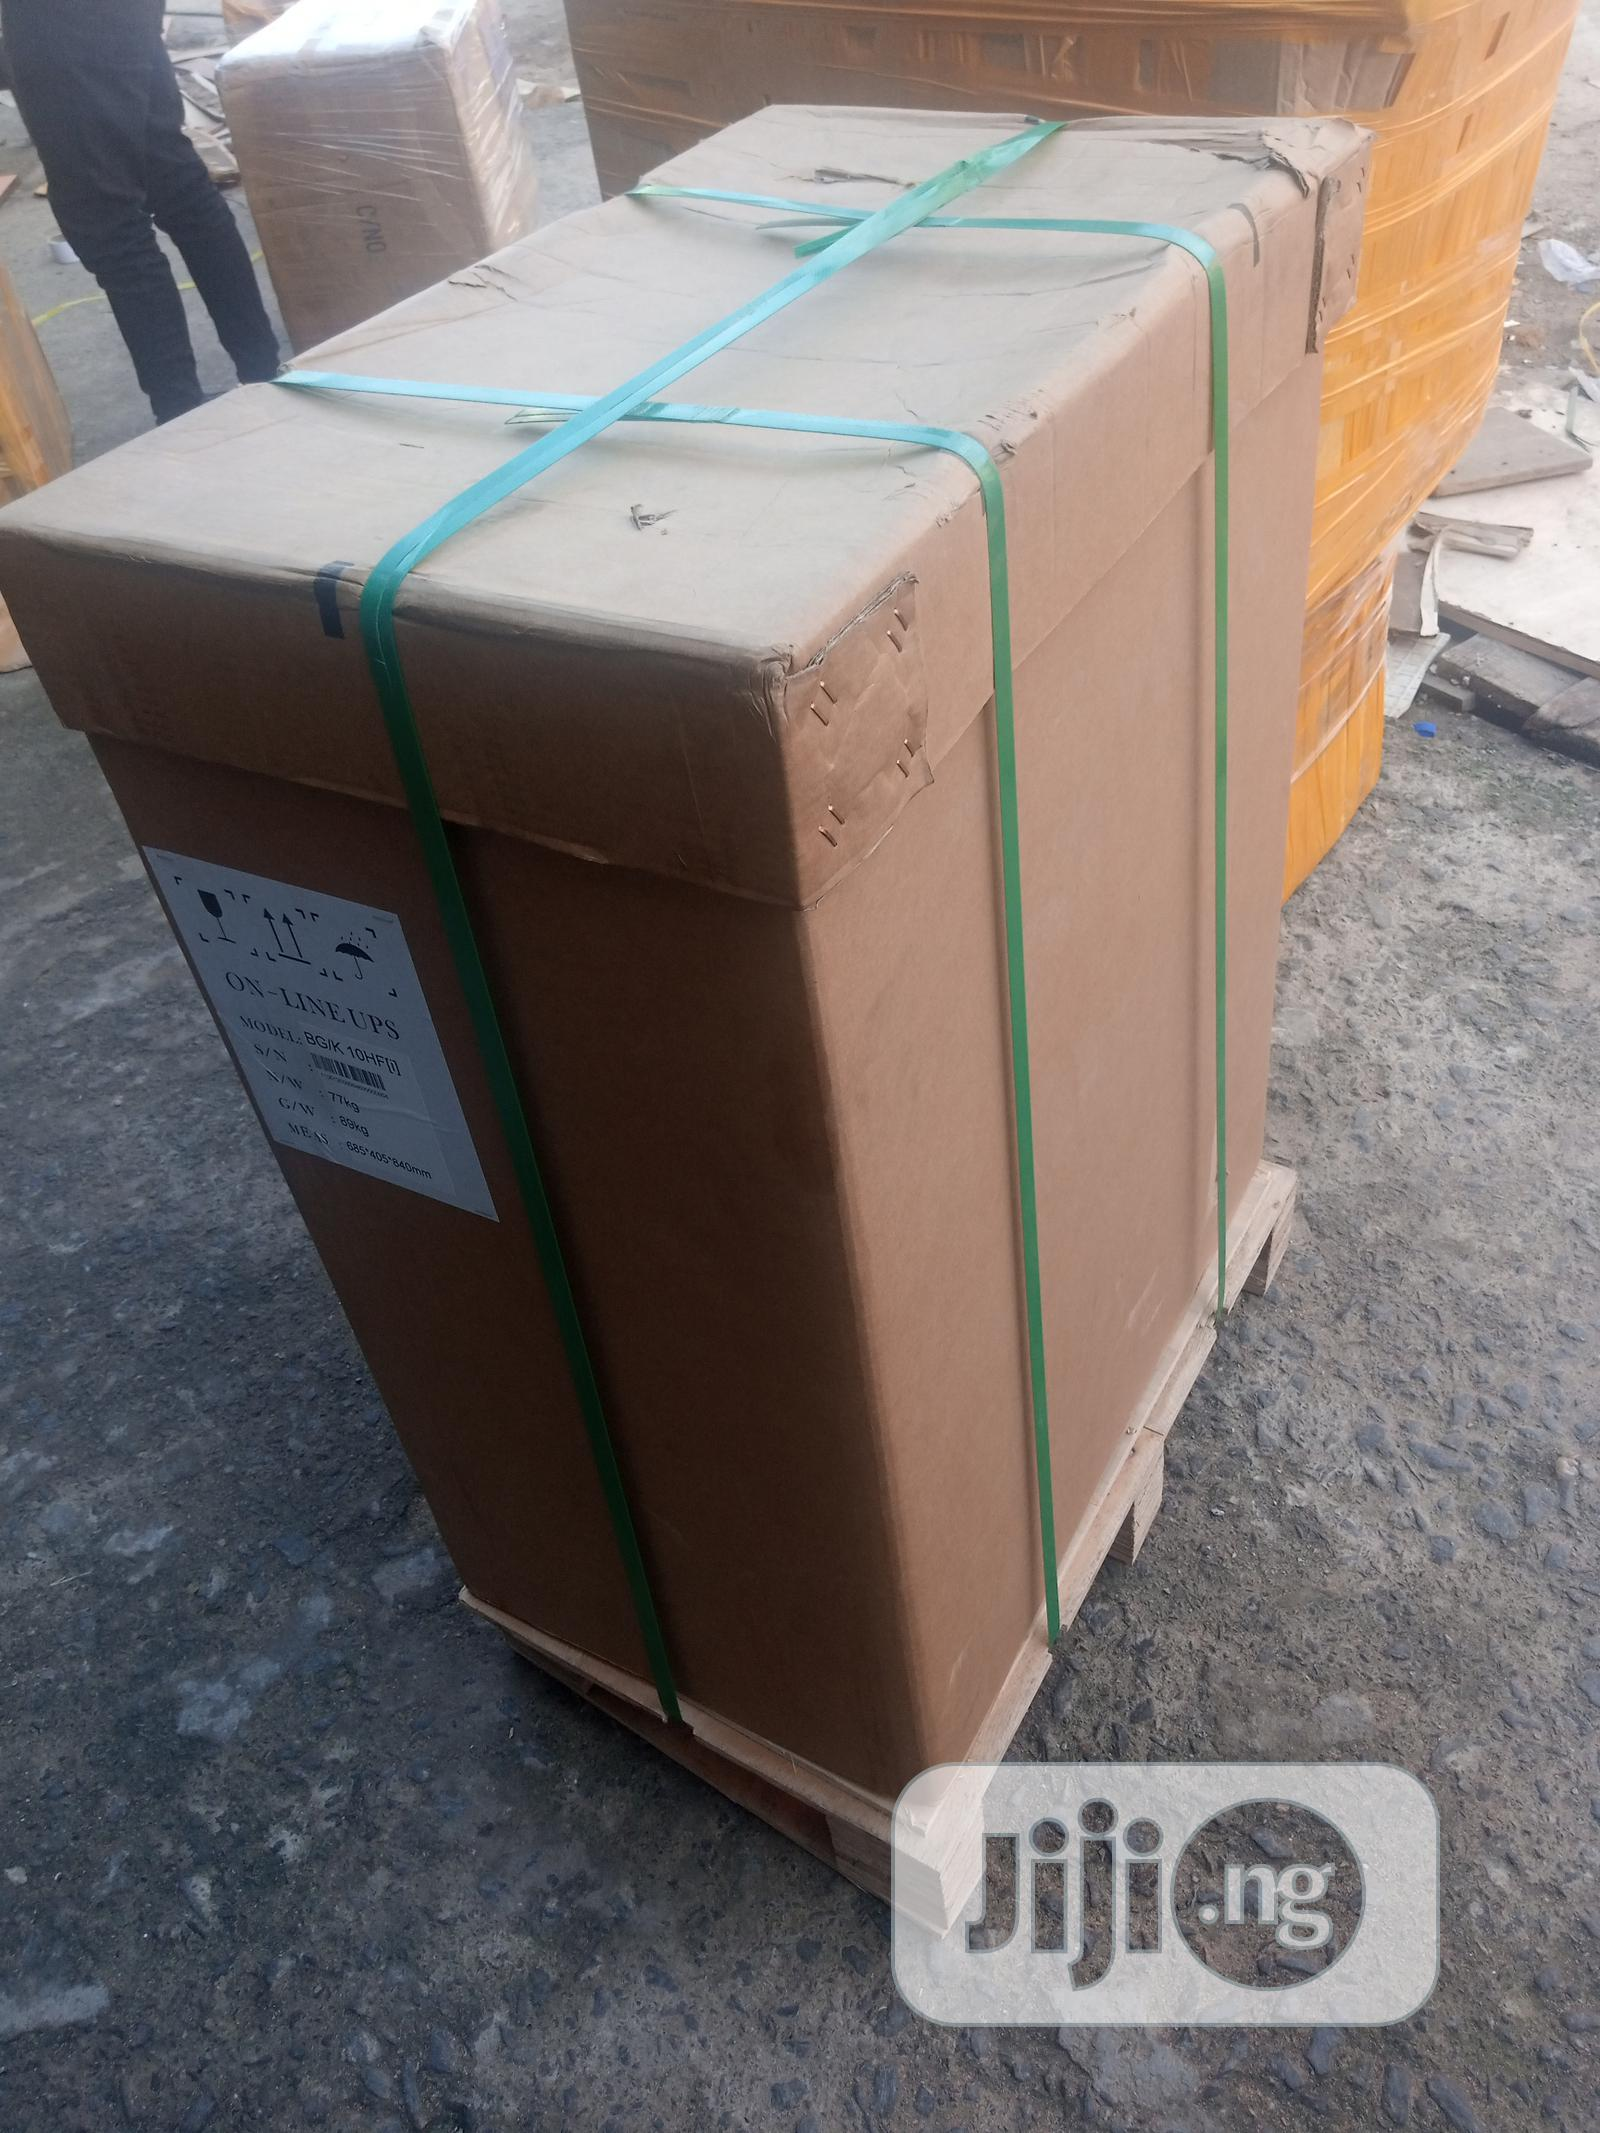 Bluegate Online 10kva Ups | Computer Hardware for sale in Ikeja, Lagos State, Nigeria